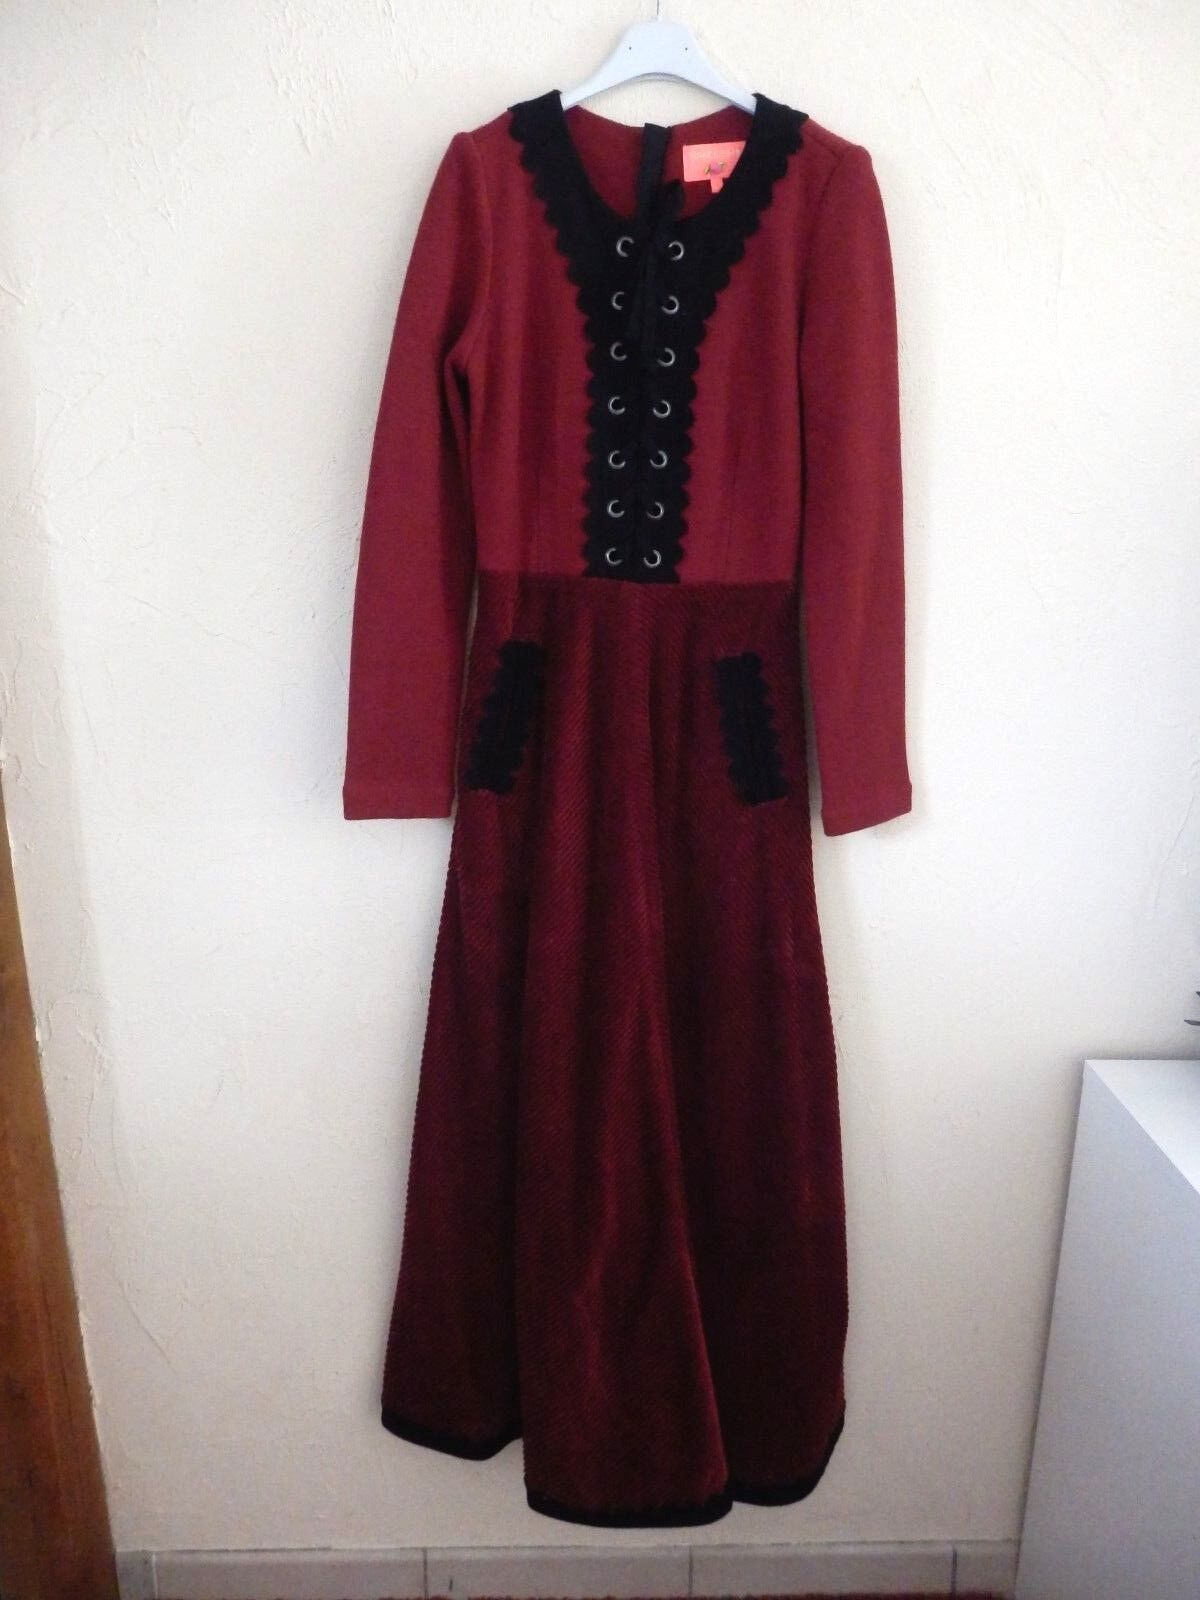 MANOUSH - Kleid - velours Cord und Wollwaren bordeaux -t. 38fr - neu